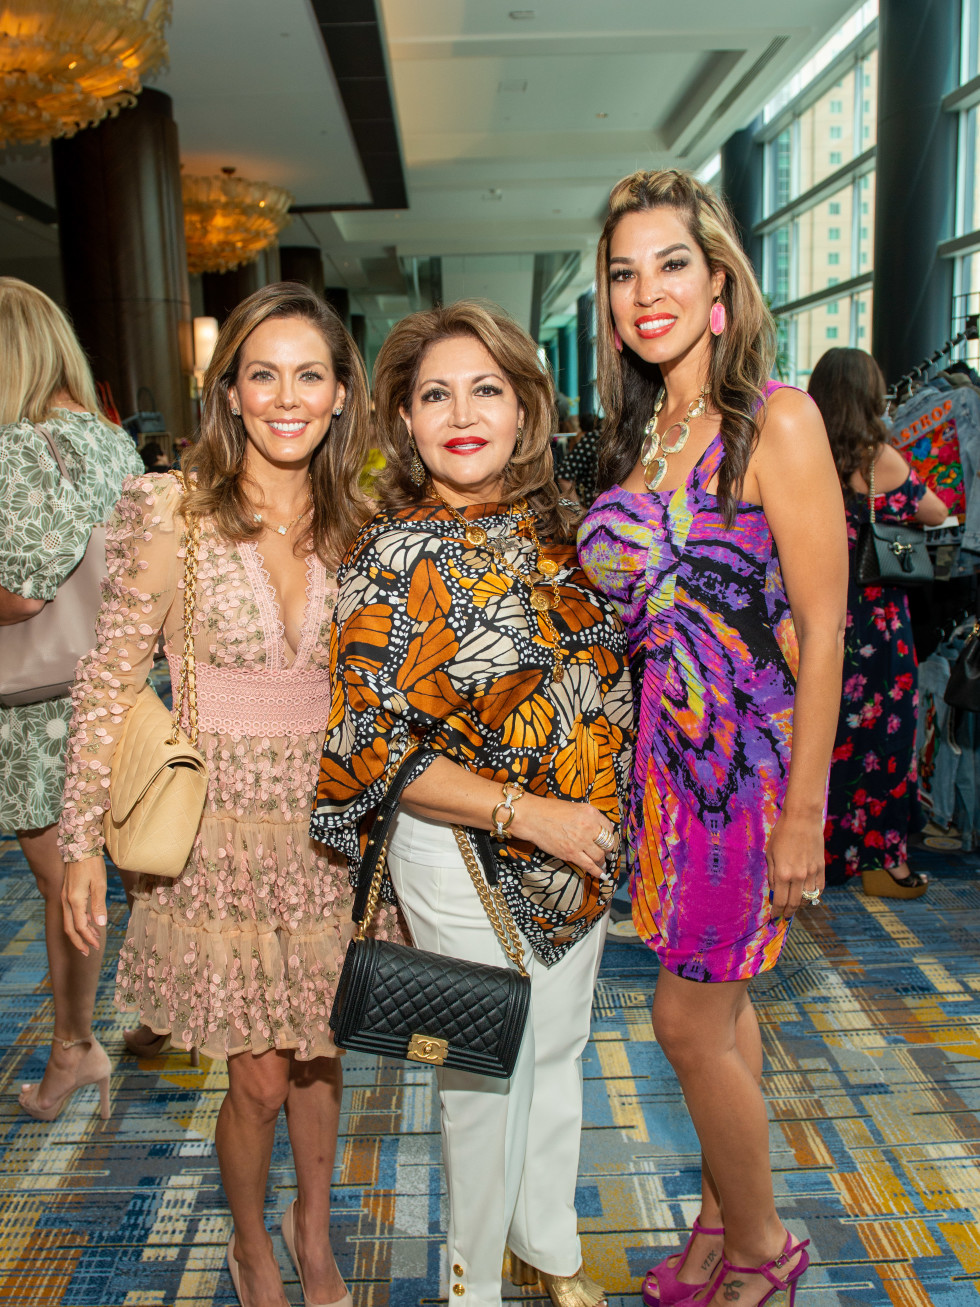 LWI Houston 2021 fashion show luncheon Ofelia Vujasonvic, Alma Gonzales, Erica Mire